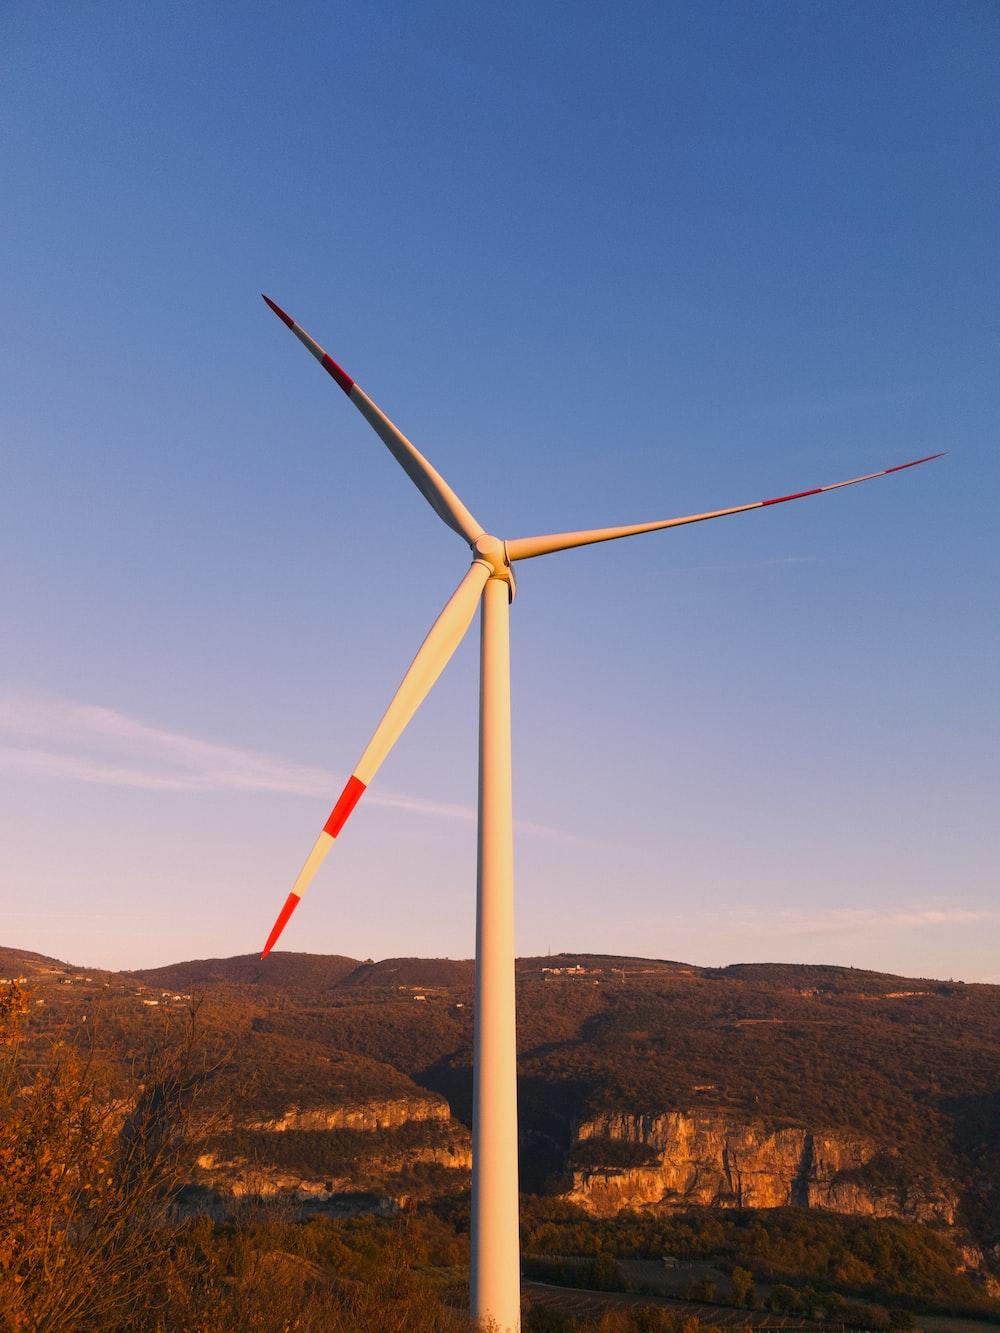 white wind turbine on brown field under blue sky during daytime